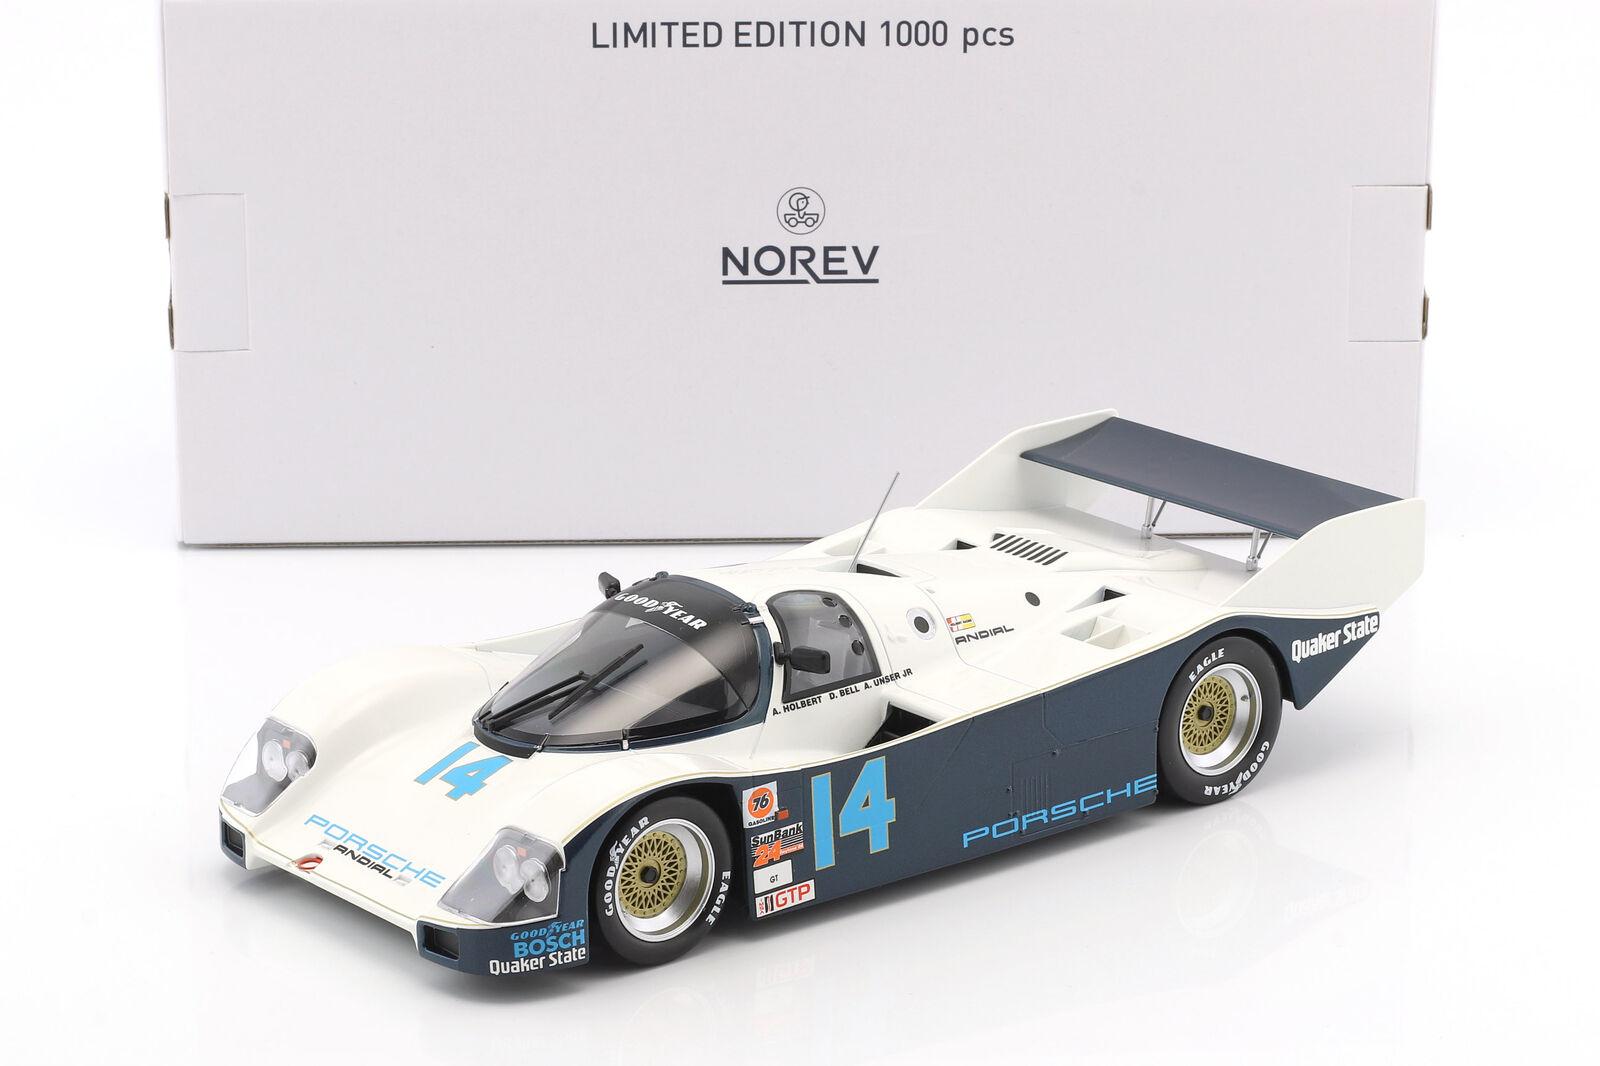 Porsche 962 C  14 WINNER 24 H DAYTONA 1986 Holbert, notre, Bell 1 18 Norev